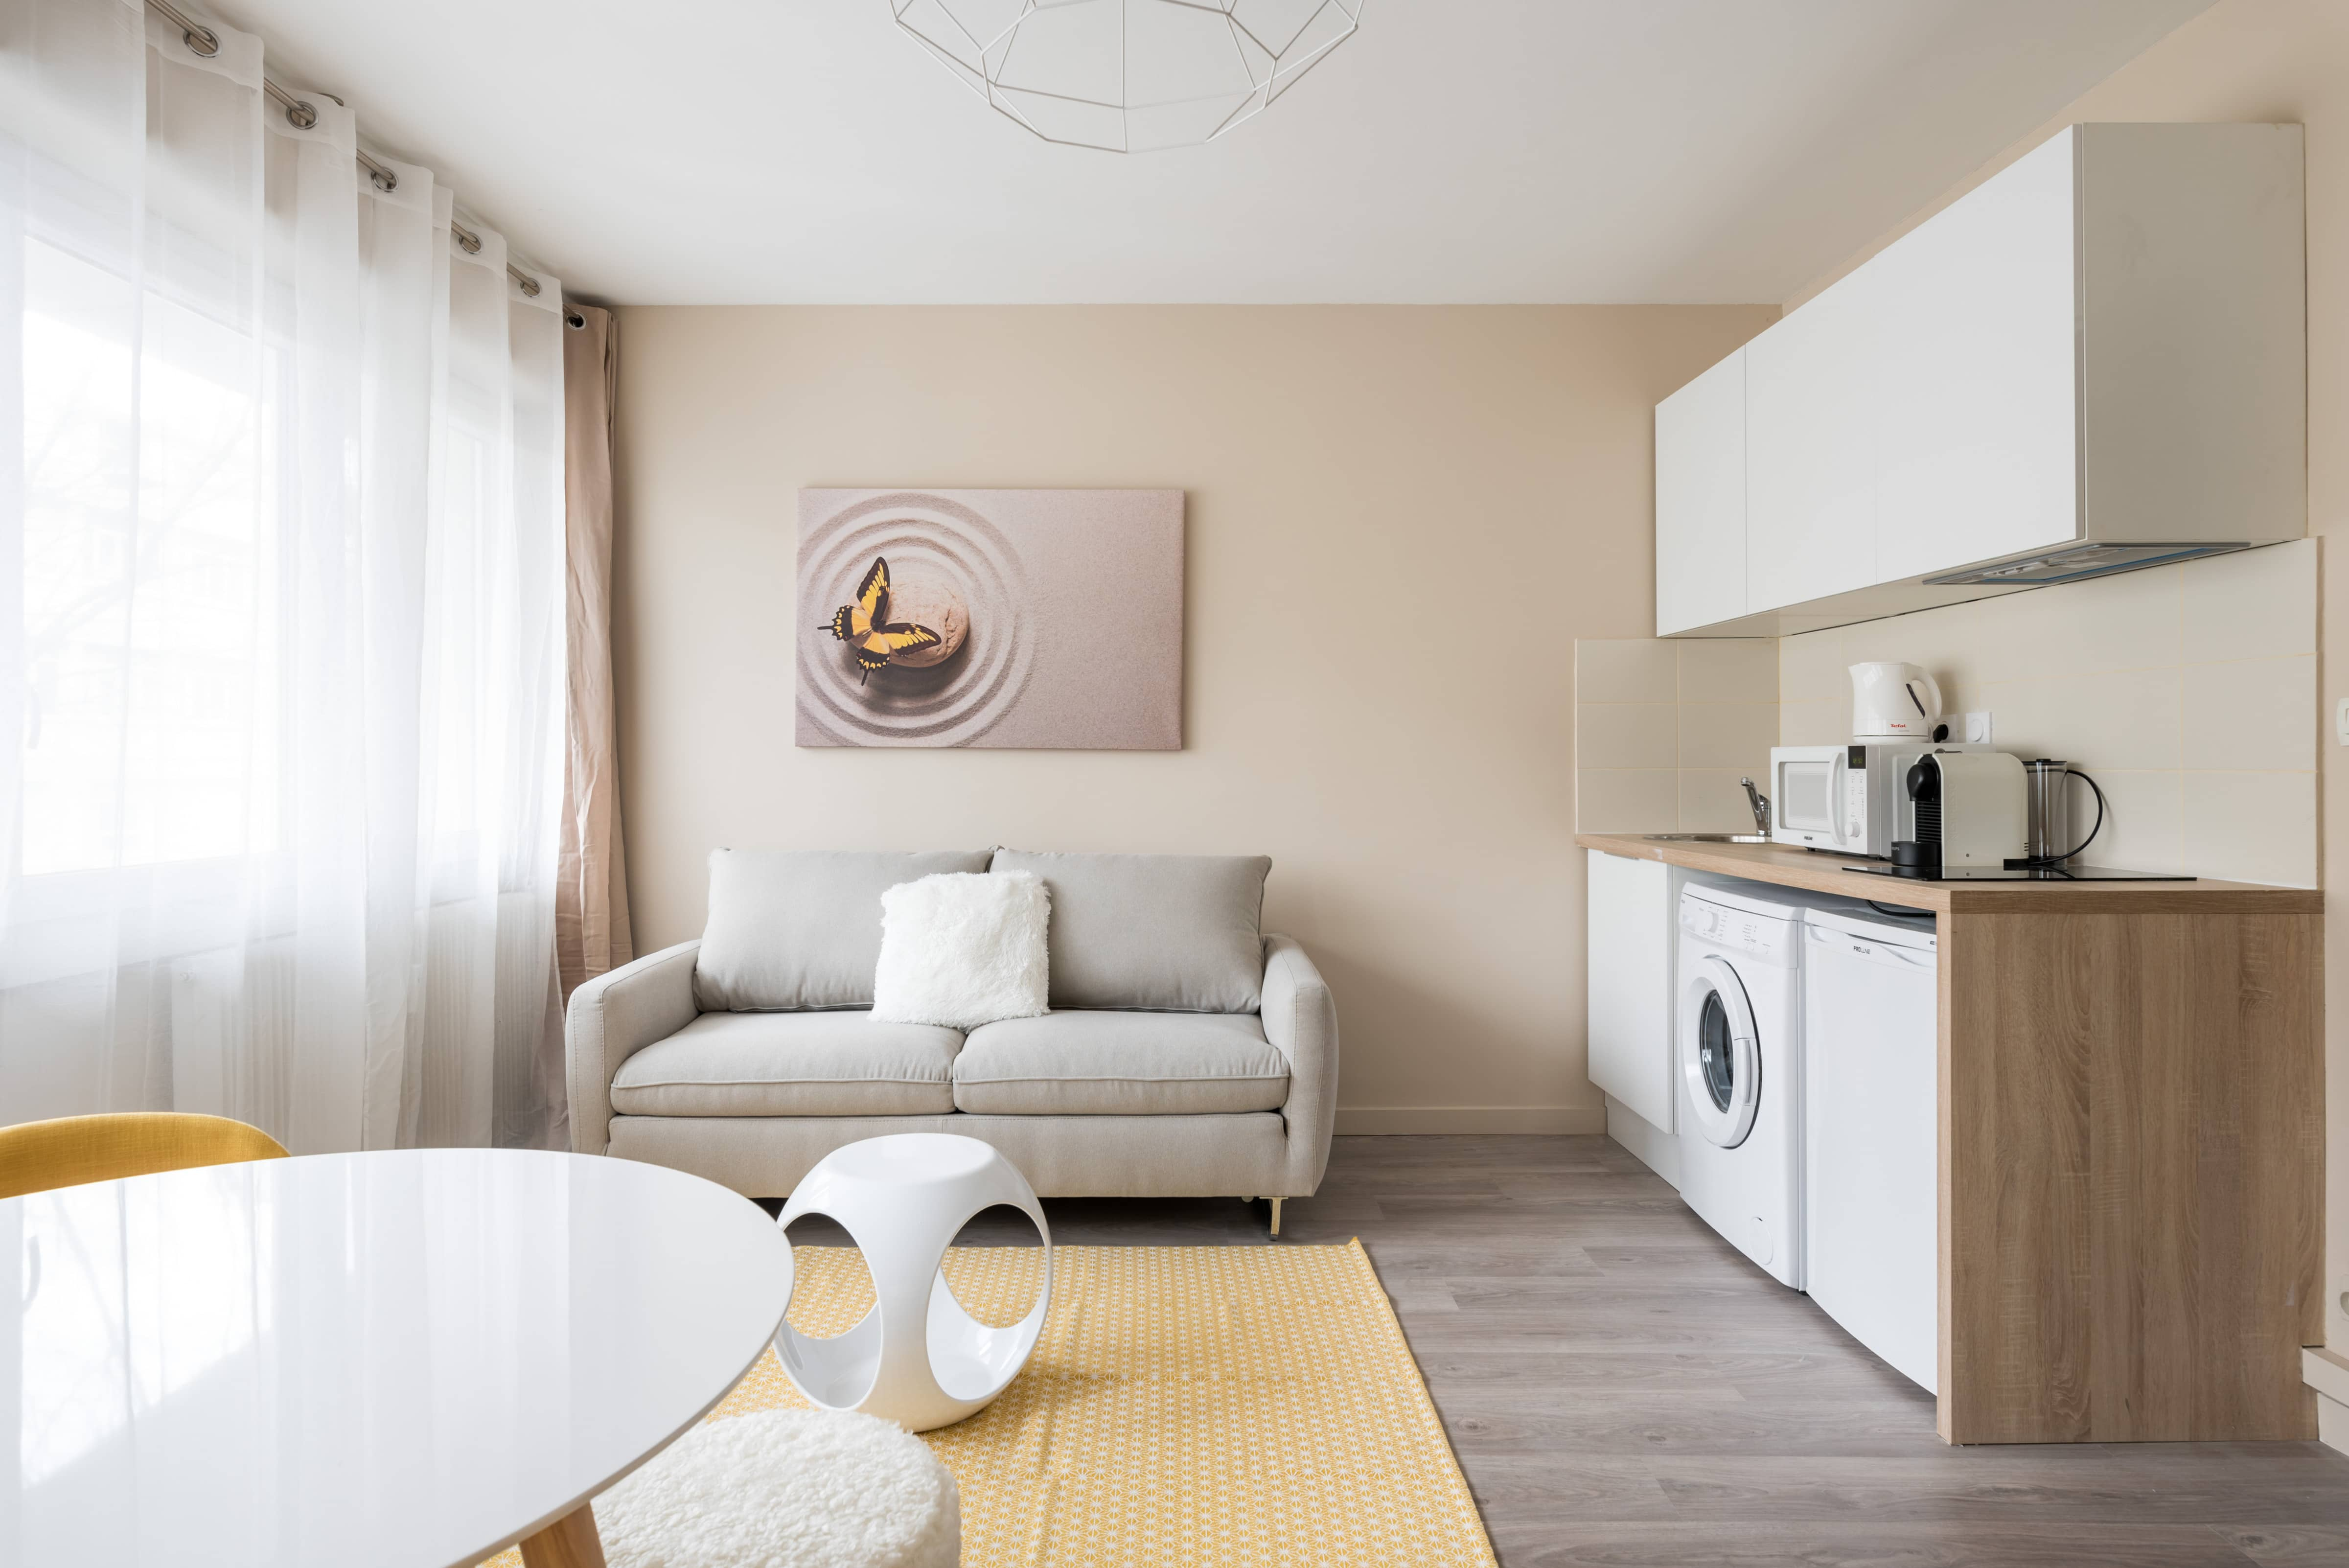 enjoy in lyon appartement lyon villeurbanne studio vintage. Black Bedroom Furniture Sets. Home Design Ideas